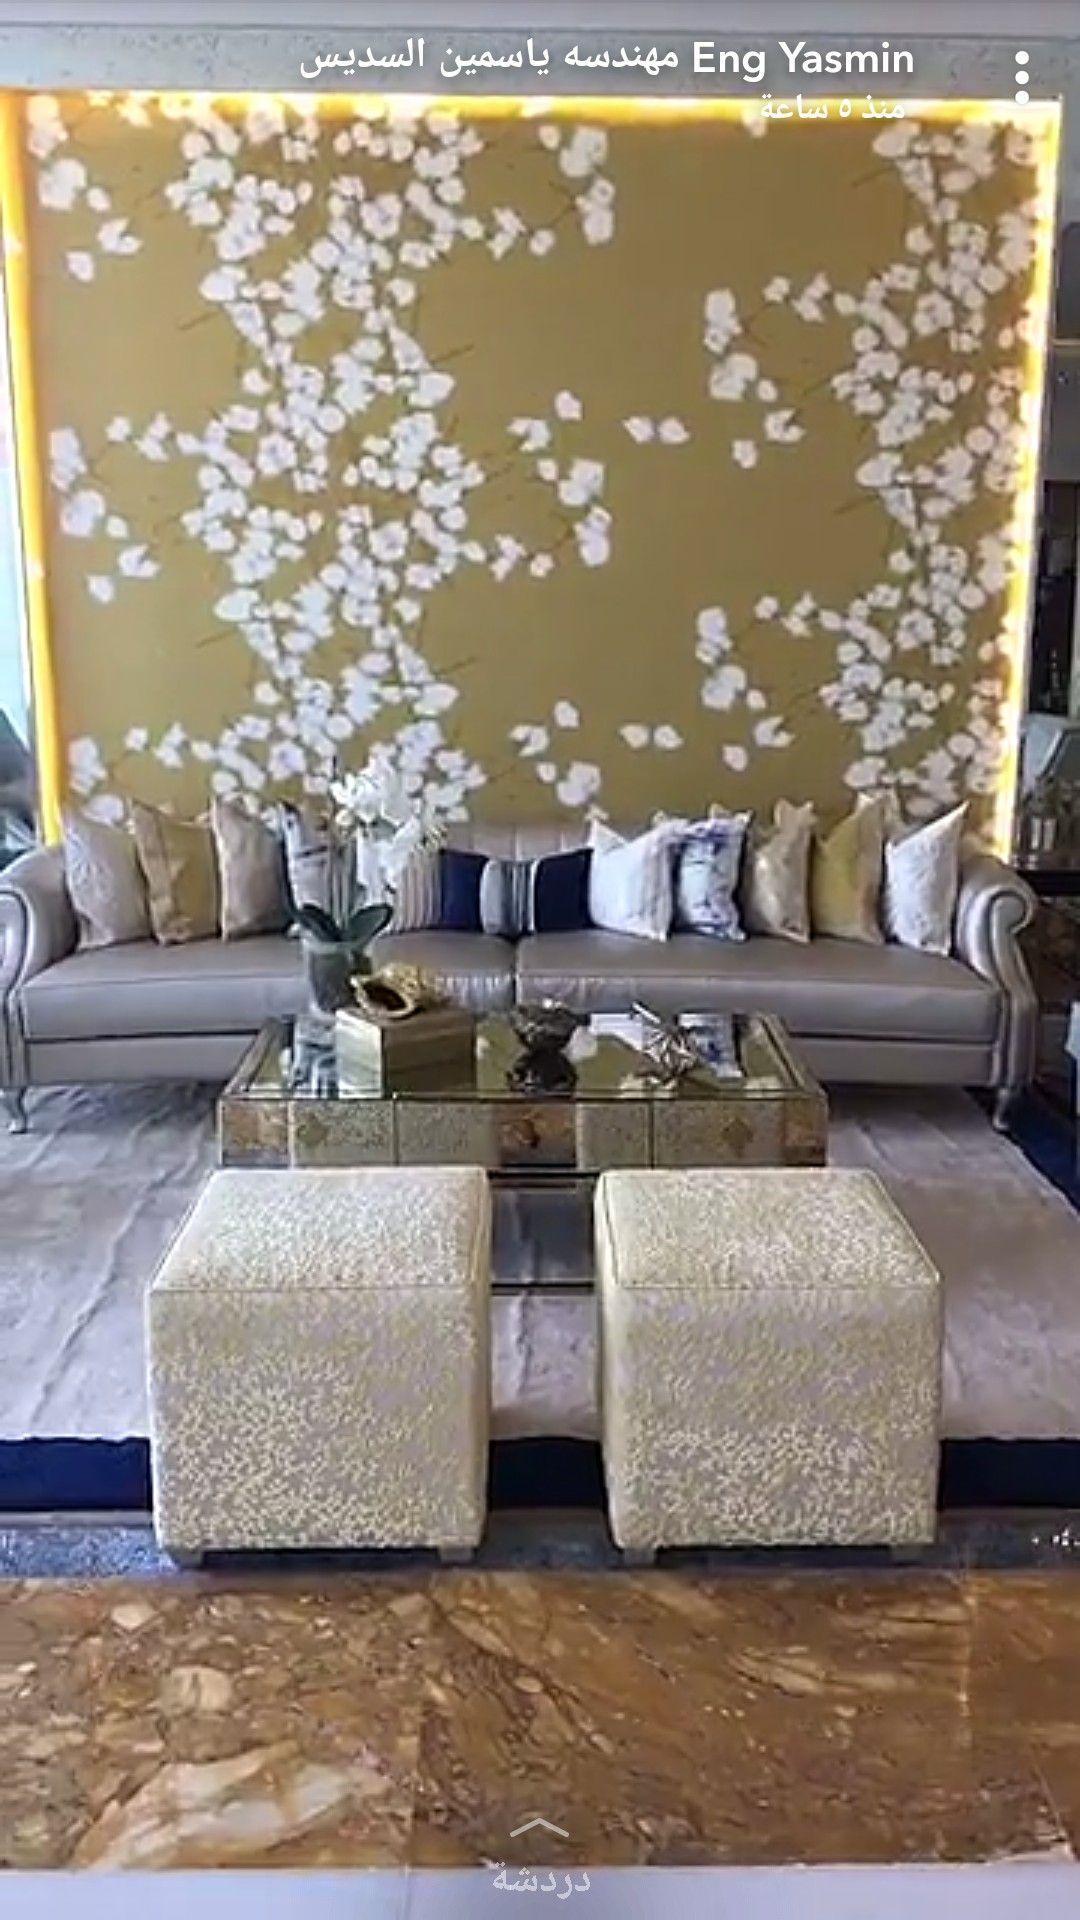 Pin By Smsm On مجالس Home Goods Decor Living Room Decor Living Room Designs